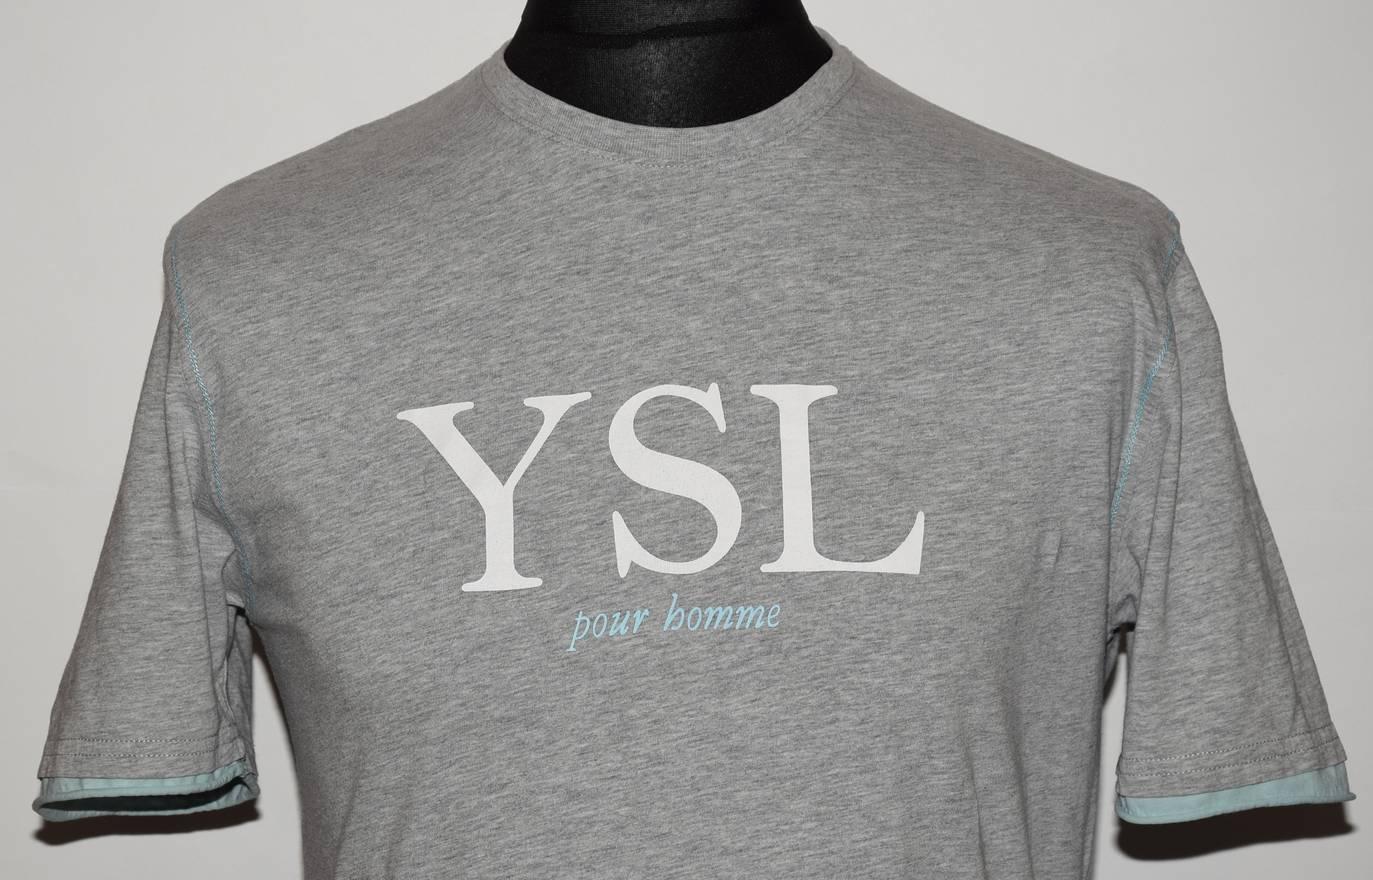 7e697295 Ysl T Shirt Mens Ebay - DREAMWORKS